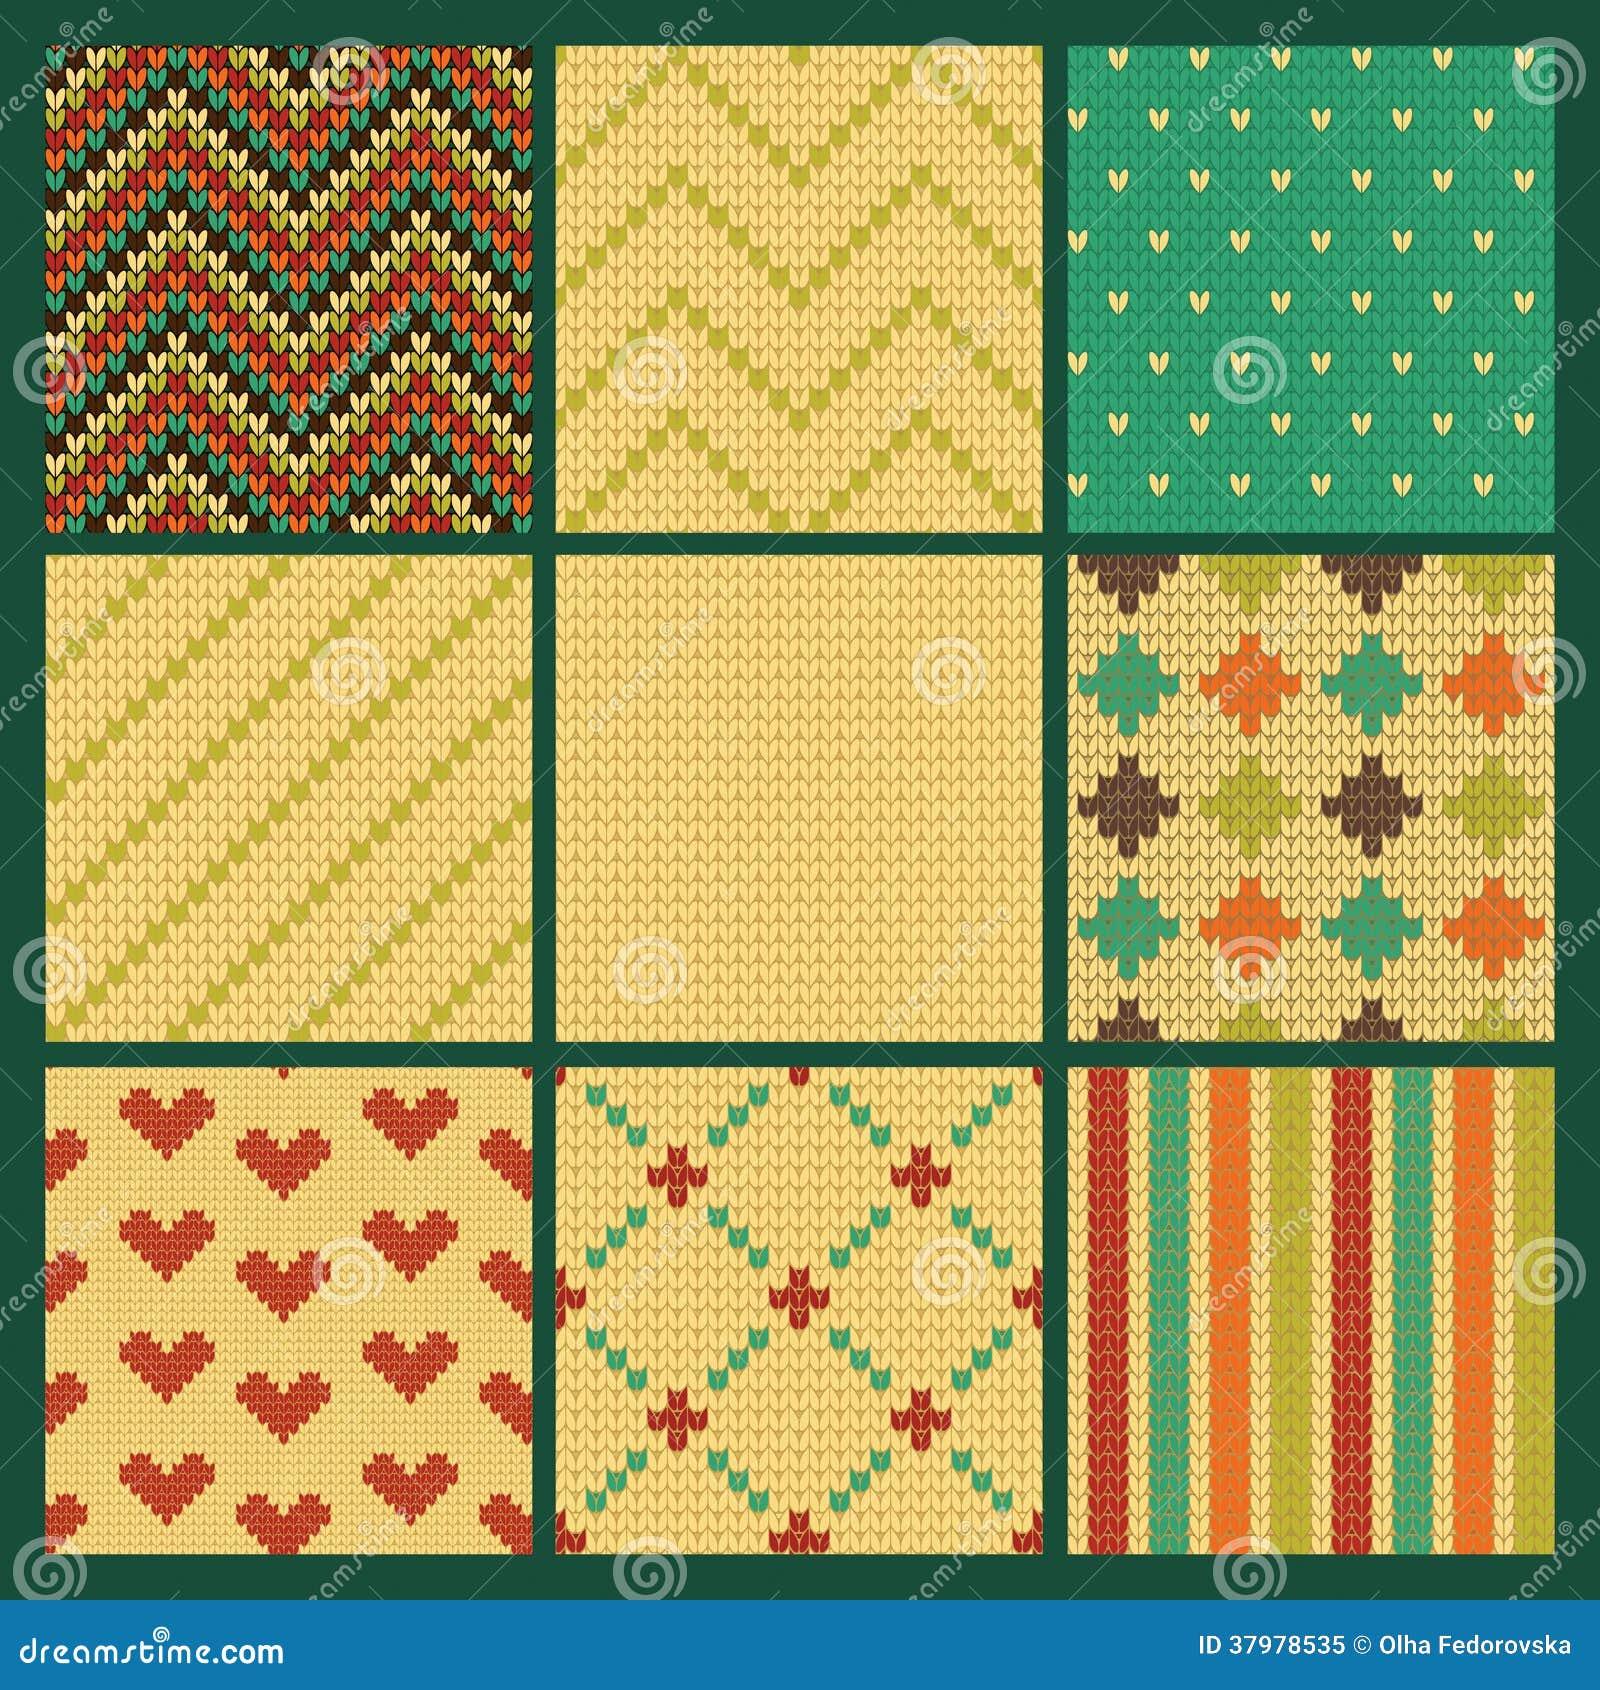 Set Of Seamless Knitting Patterns Royalty Free Stock Photo - Image: 37978535